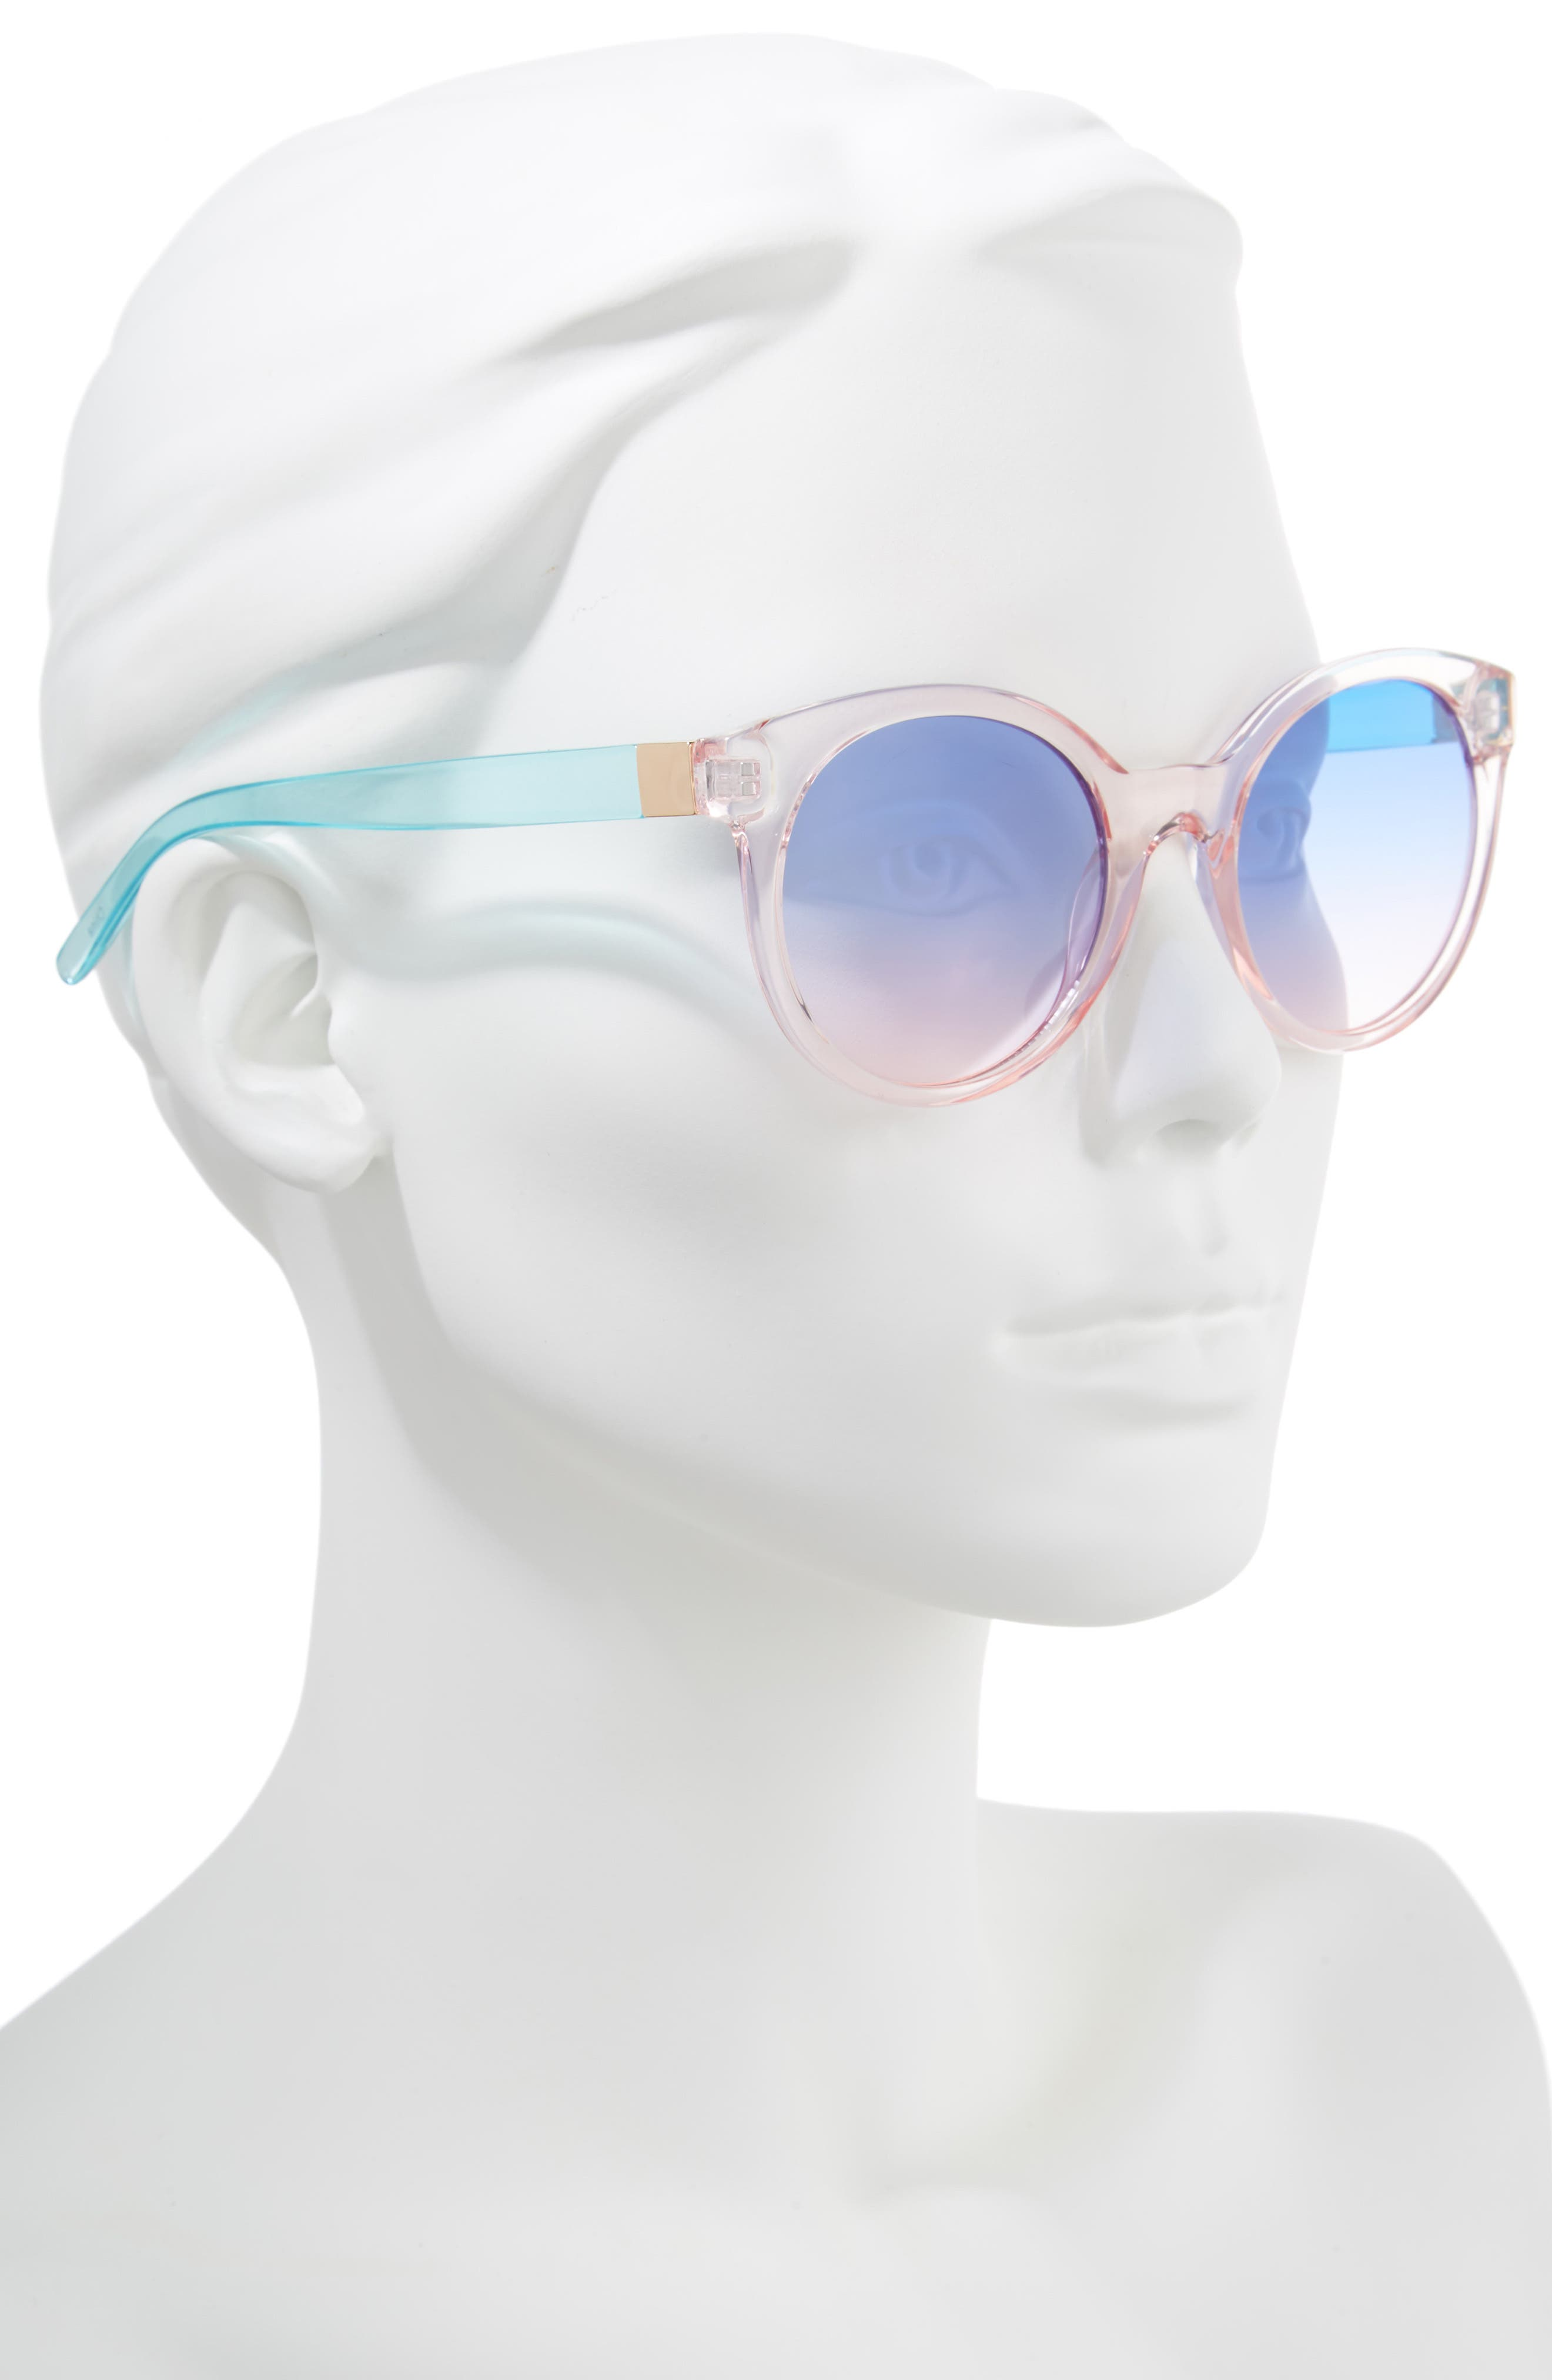 Transparent Round Sunglasses,                             Alternate thumbnail 2, color,                             100